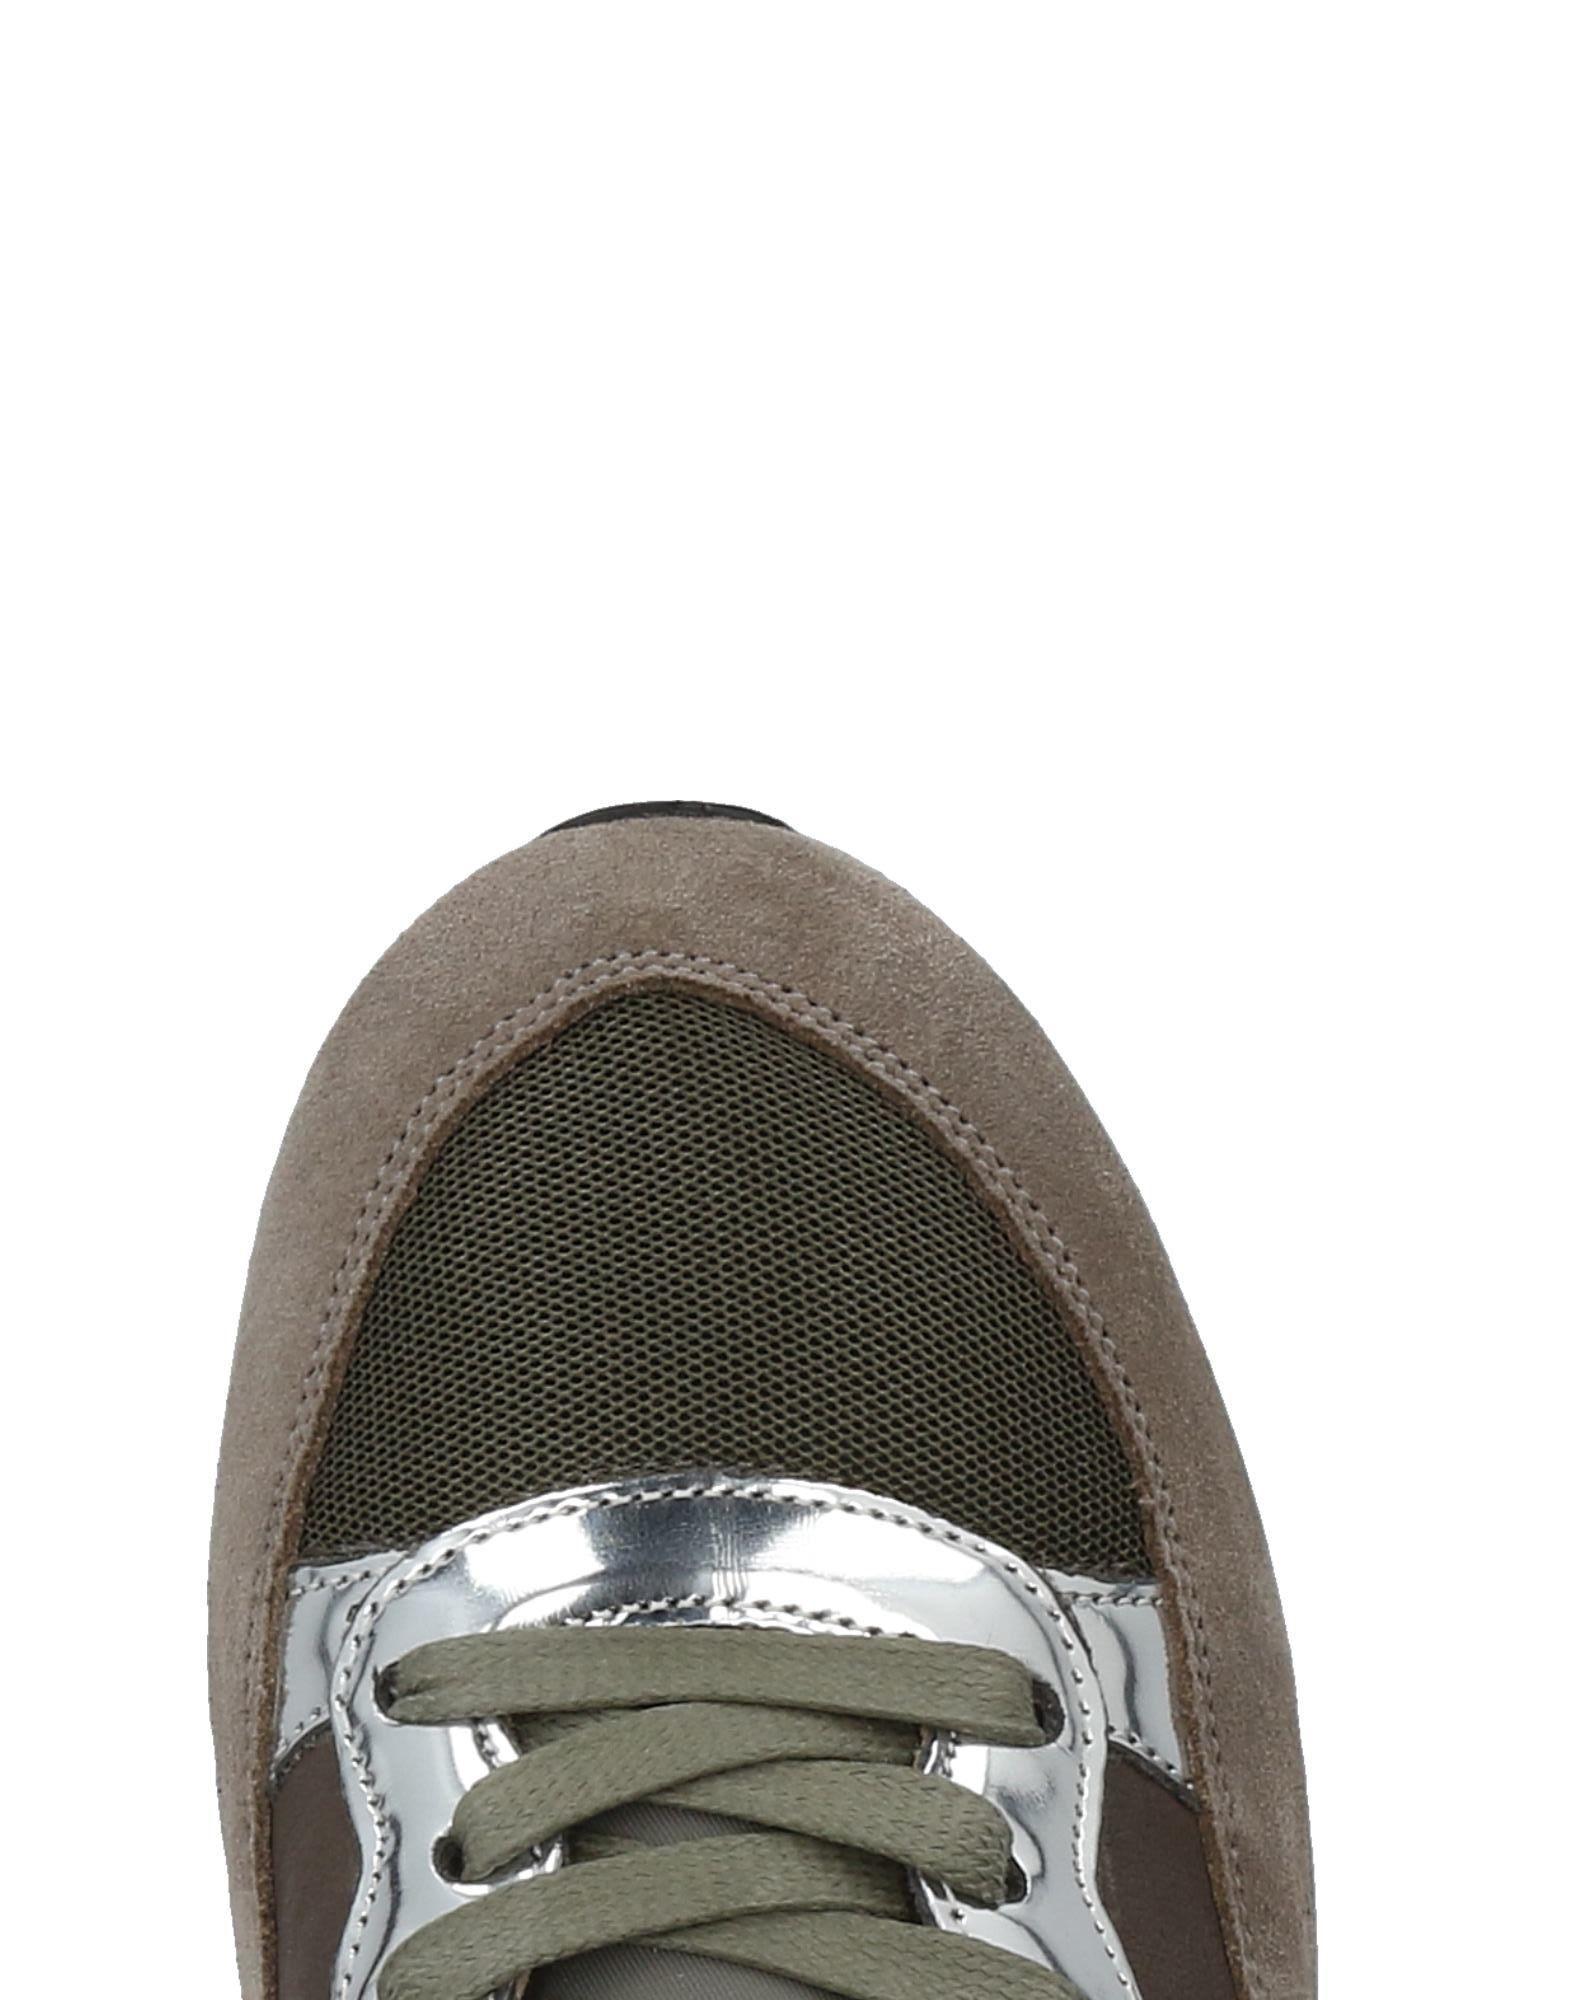 Quattrobarradodici Damen Sneakers Damen Quattrobarradodici  11434362ES Gute Qualität beliebte Schuhe 5d4aaf